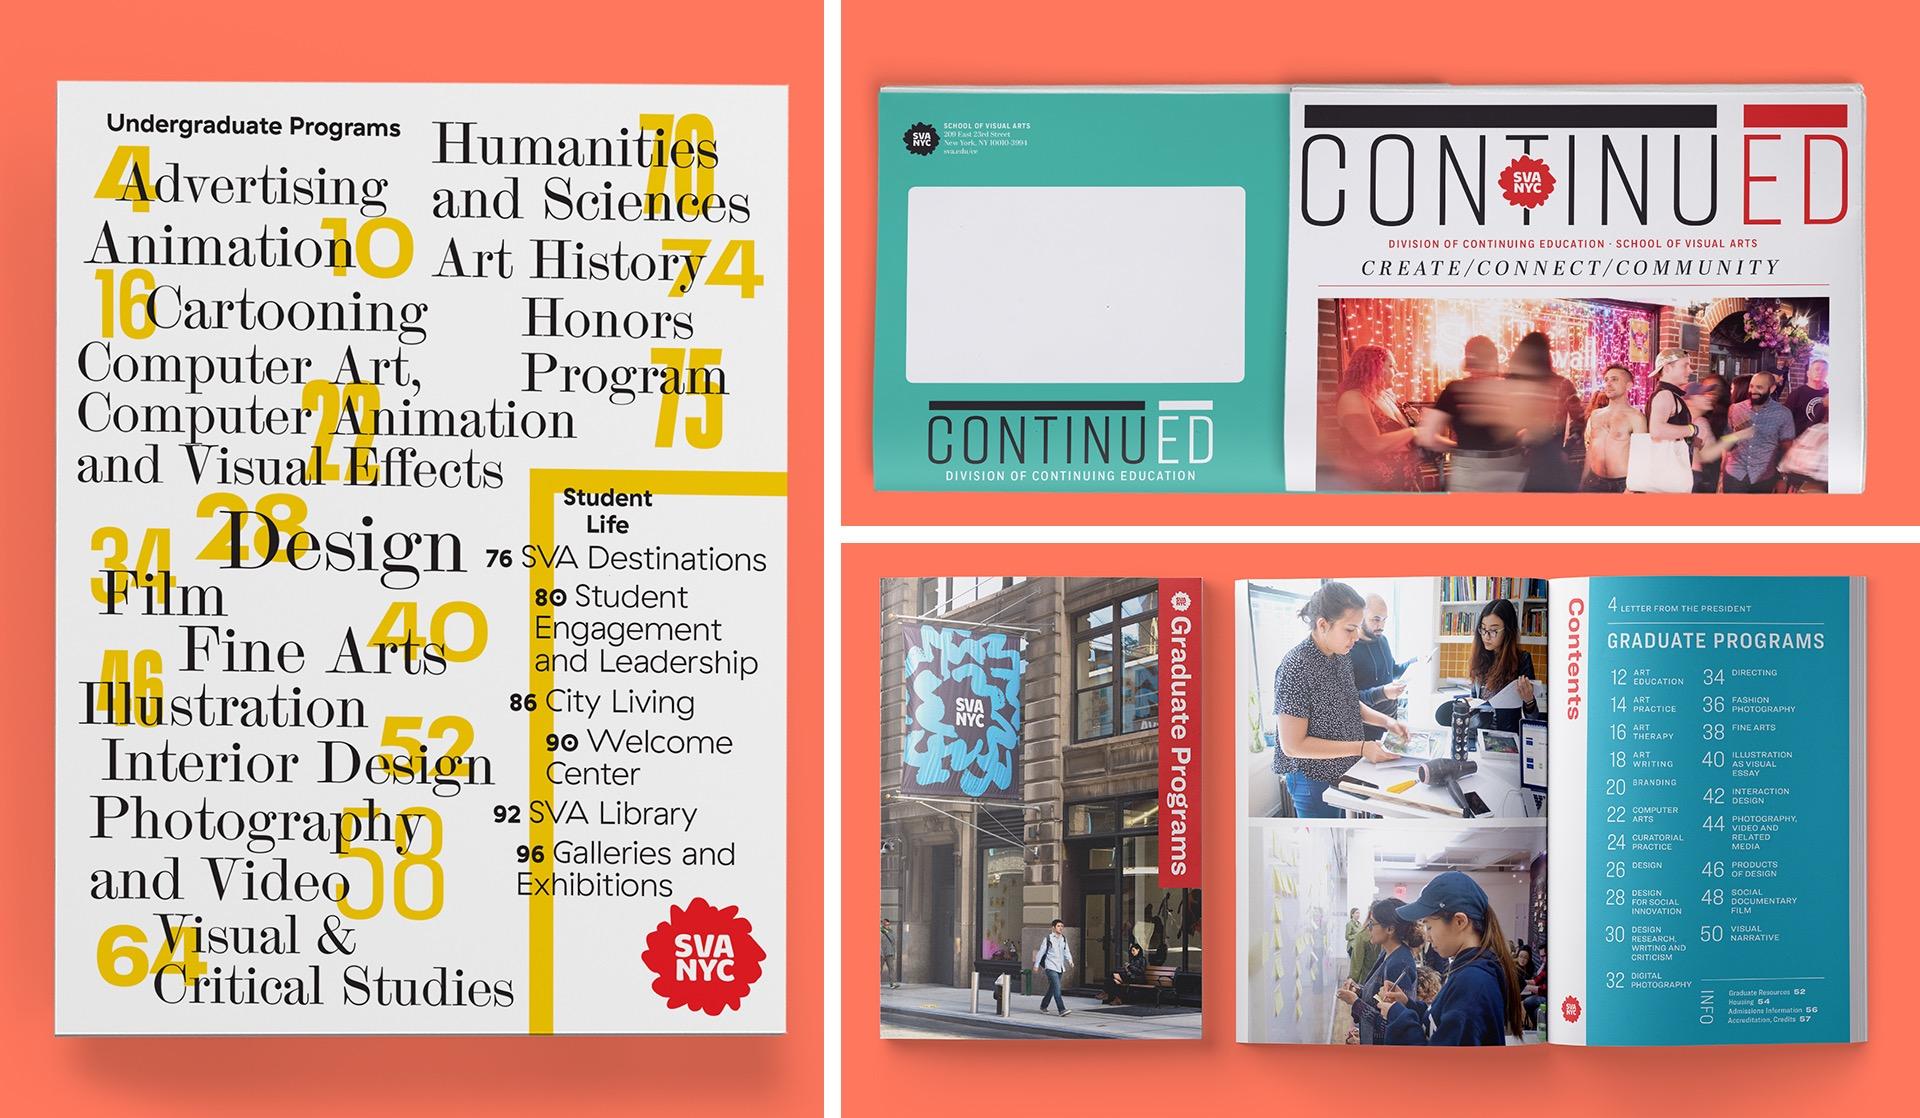 The Undergraduate Viewbook, Graduate Viewbook, and the ContinuED Newsletter.